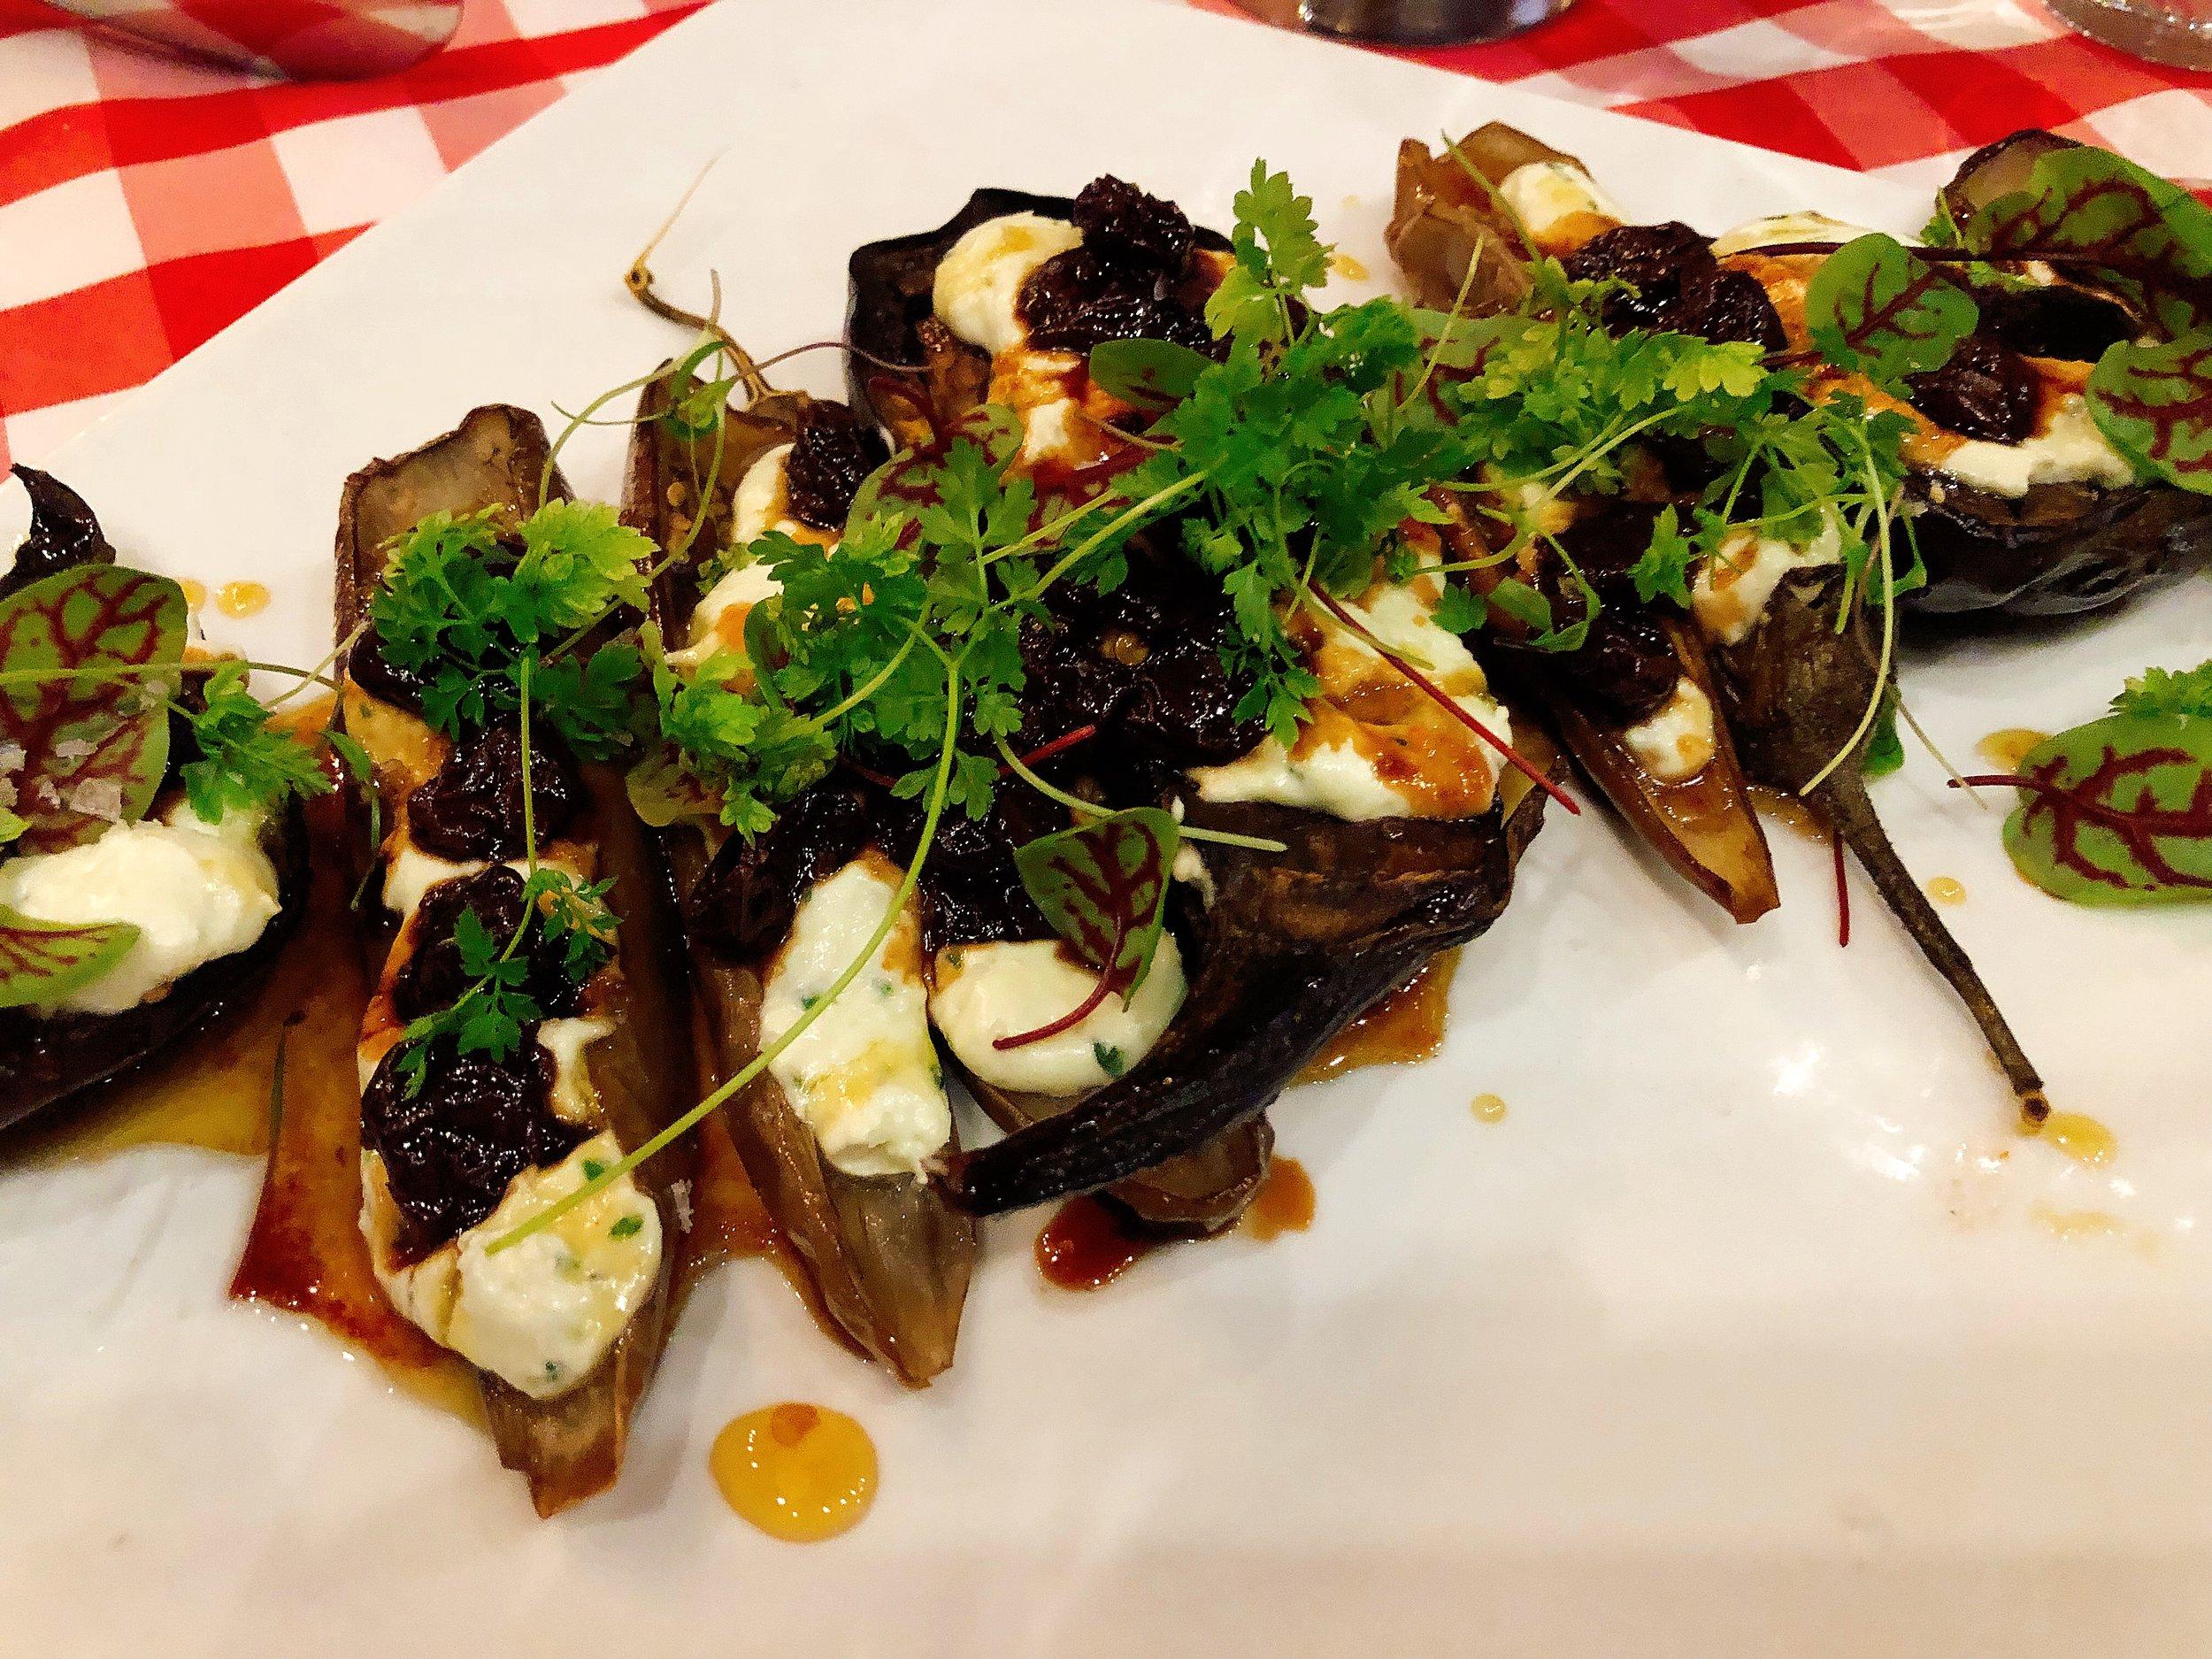 Whipped Feta + Eggplant + Pickled Cherries